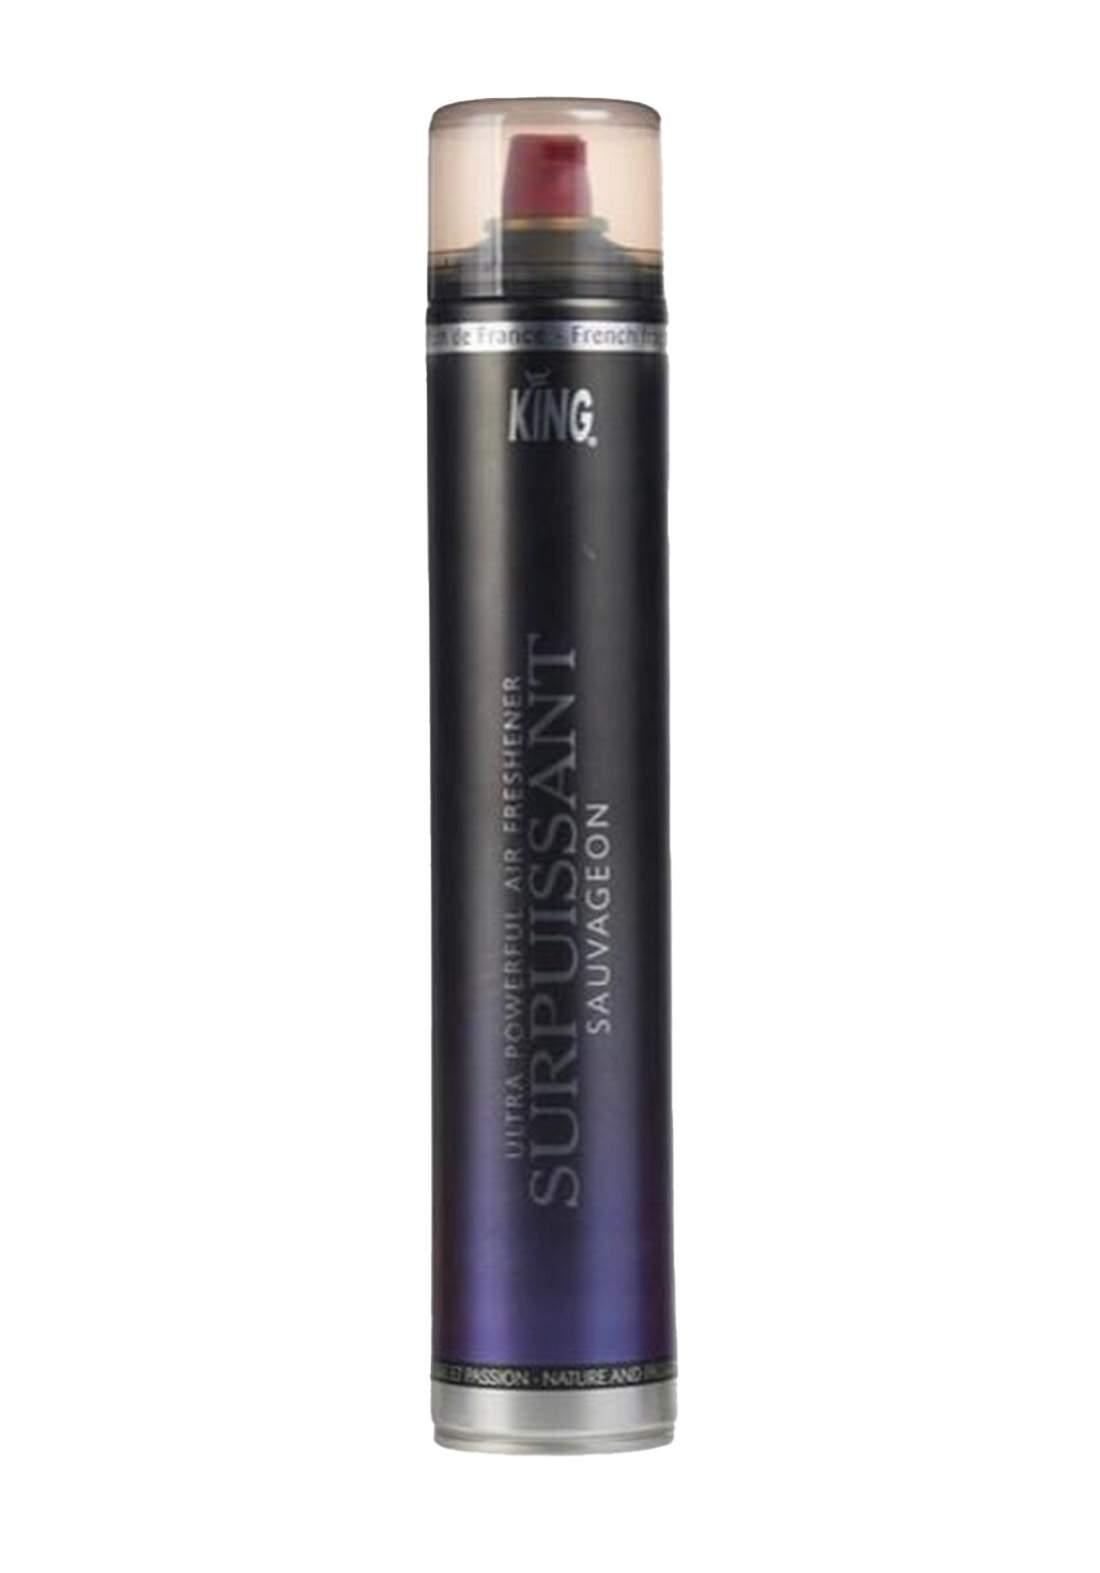 S.I.C.O King Air Perfume 750ml معطر جو مركز